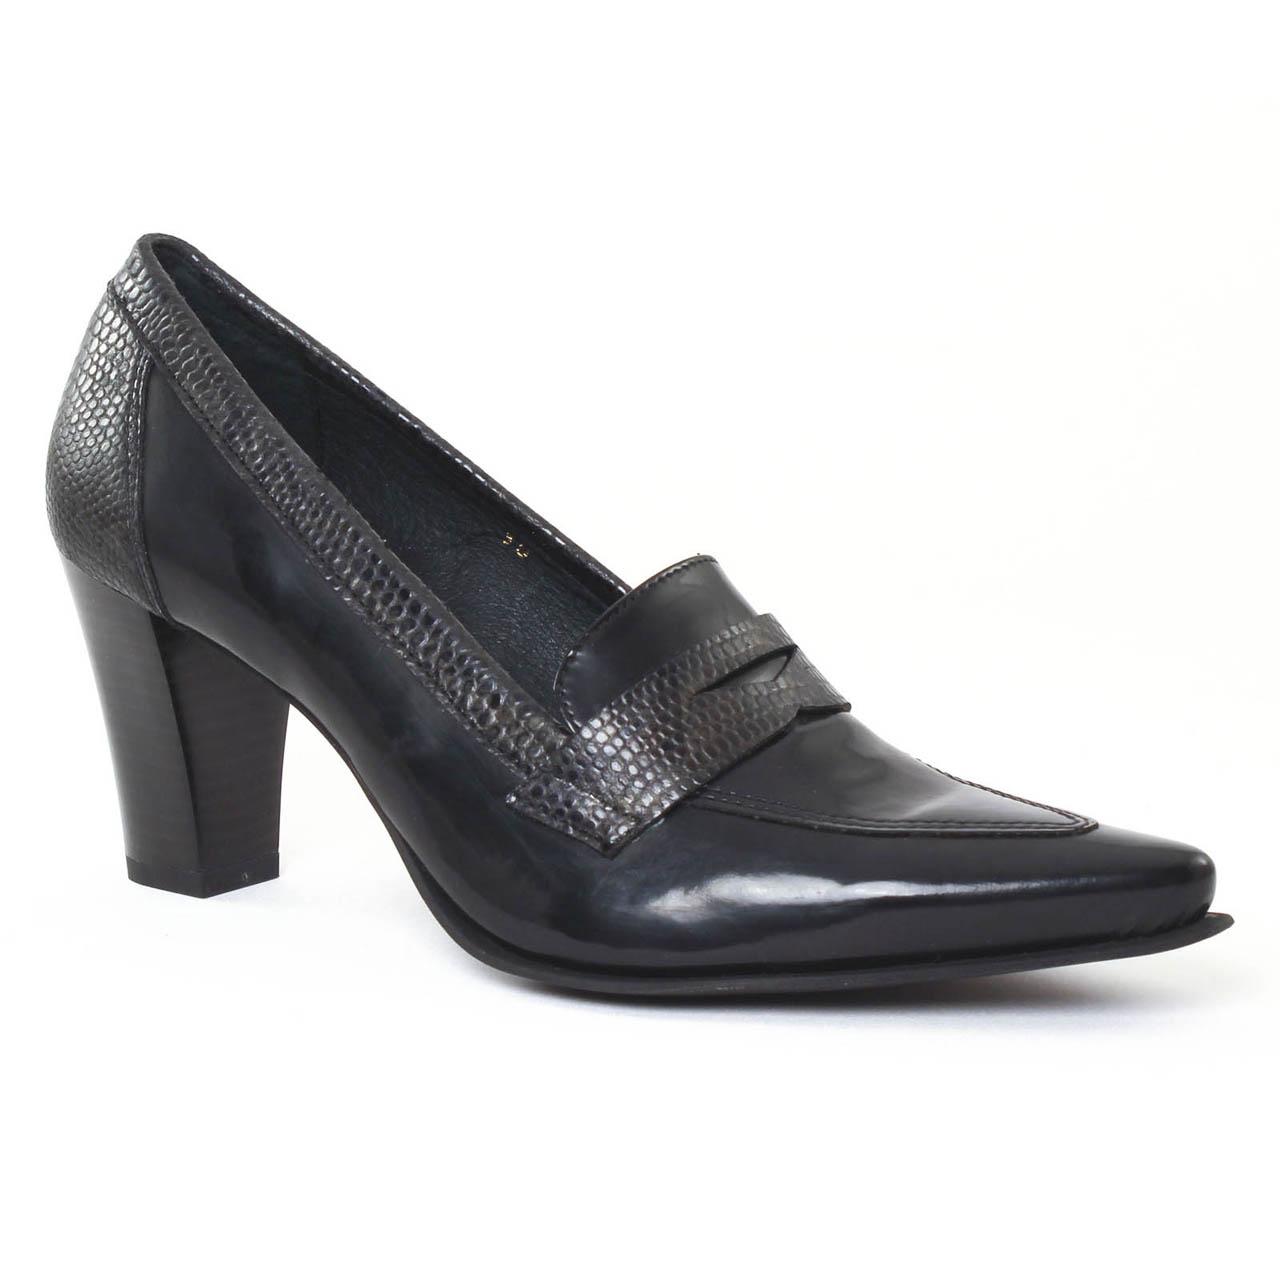 chaussures plates femme hiver. Black Bedroom Furniture Sets. Home Design Ideas